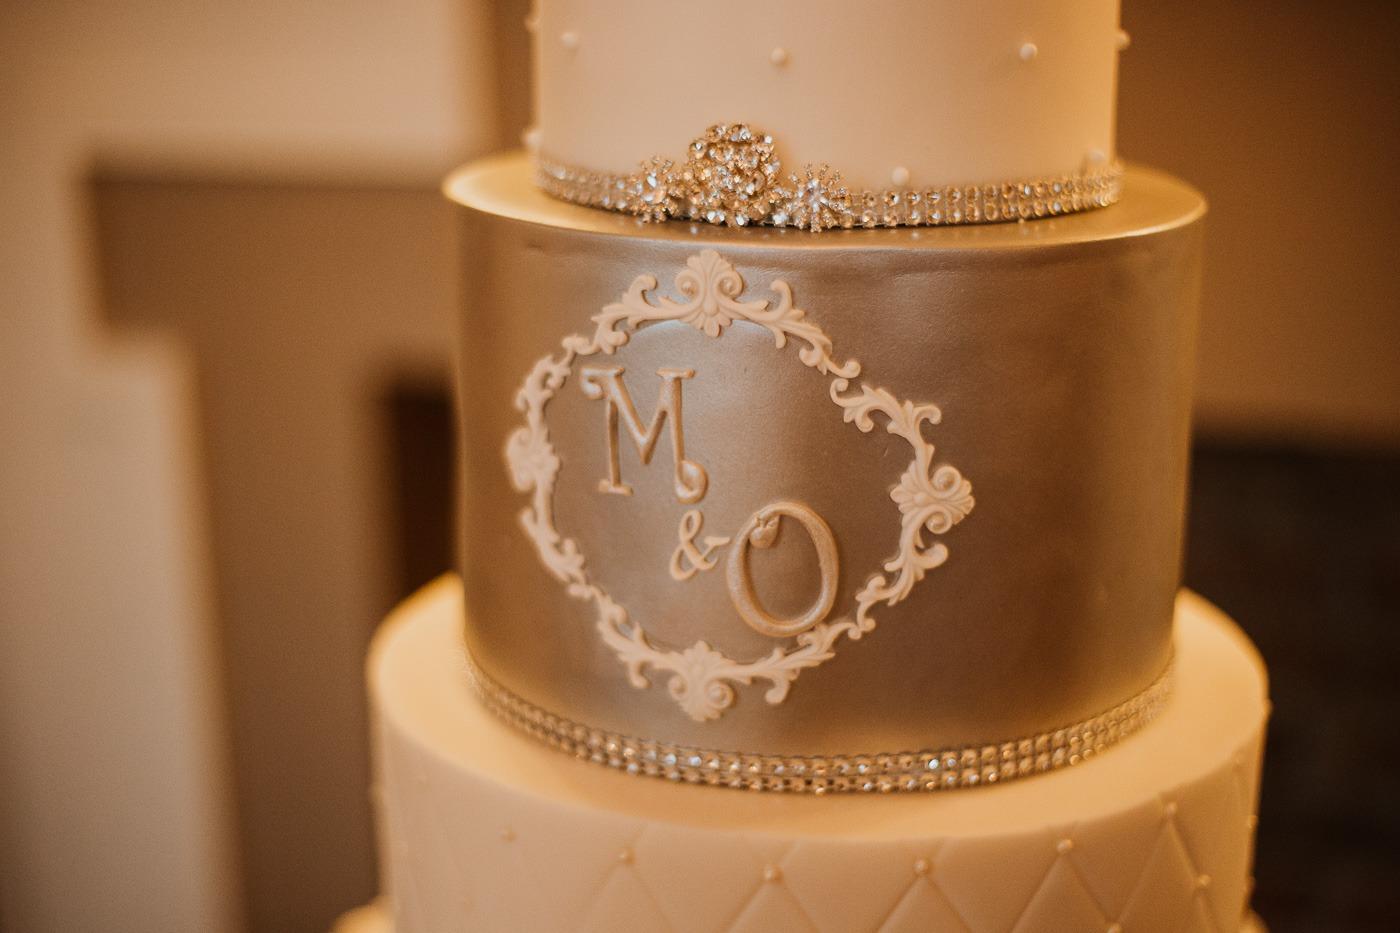 A wedding cake